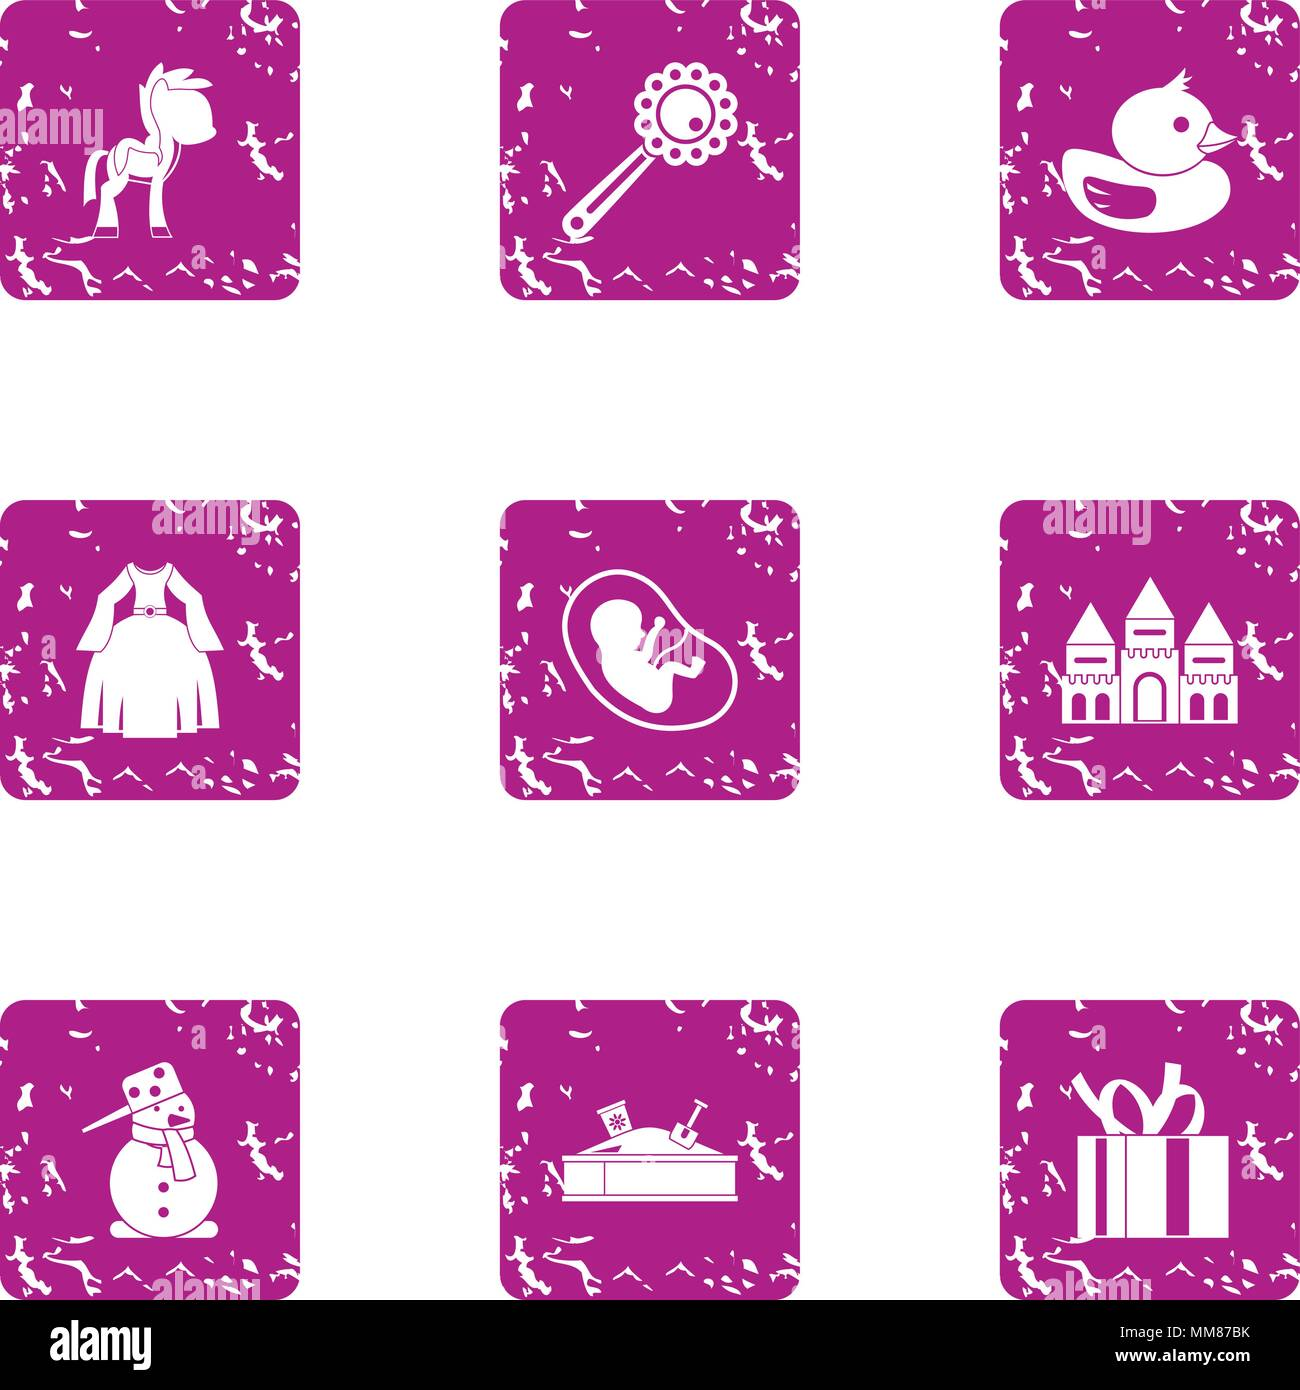 Children beginning icons set, grunge style - Stock Image